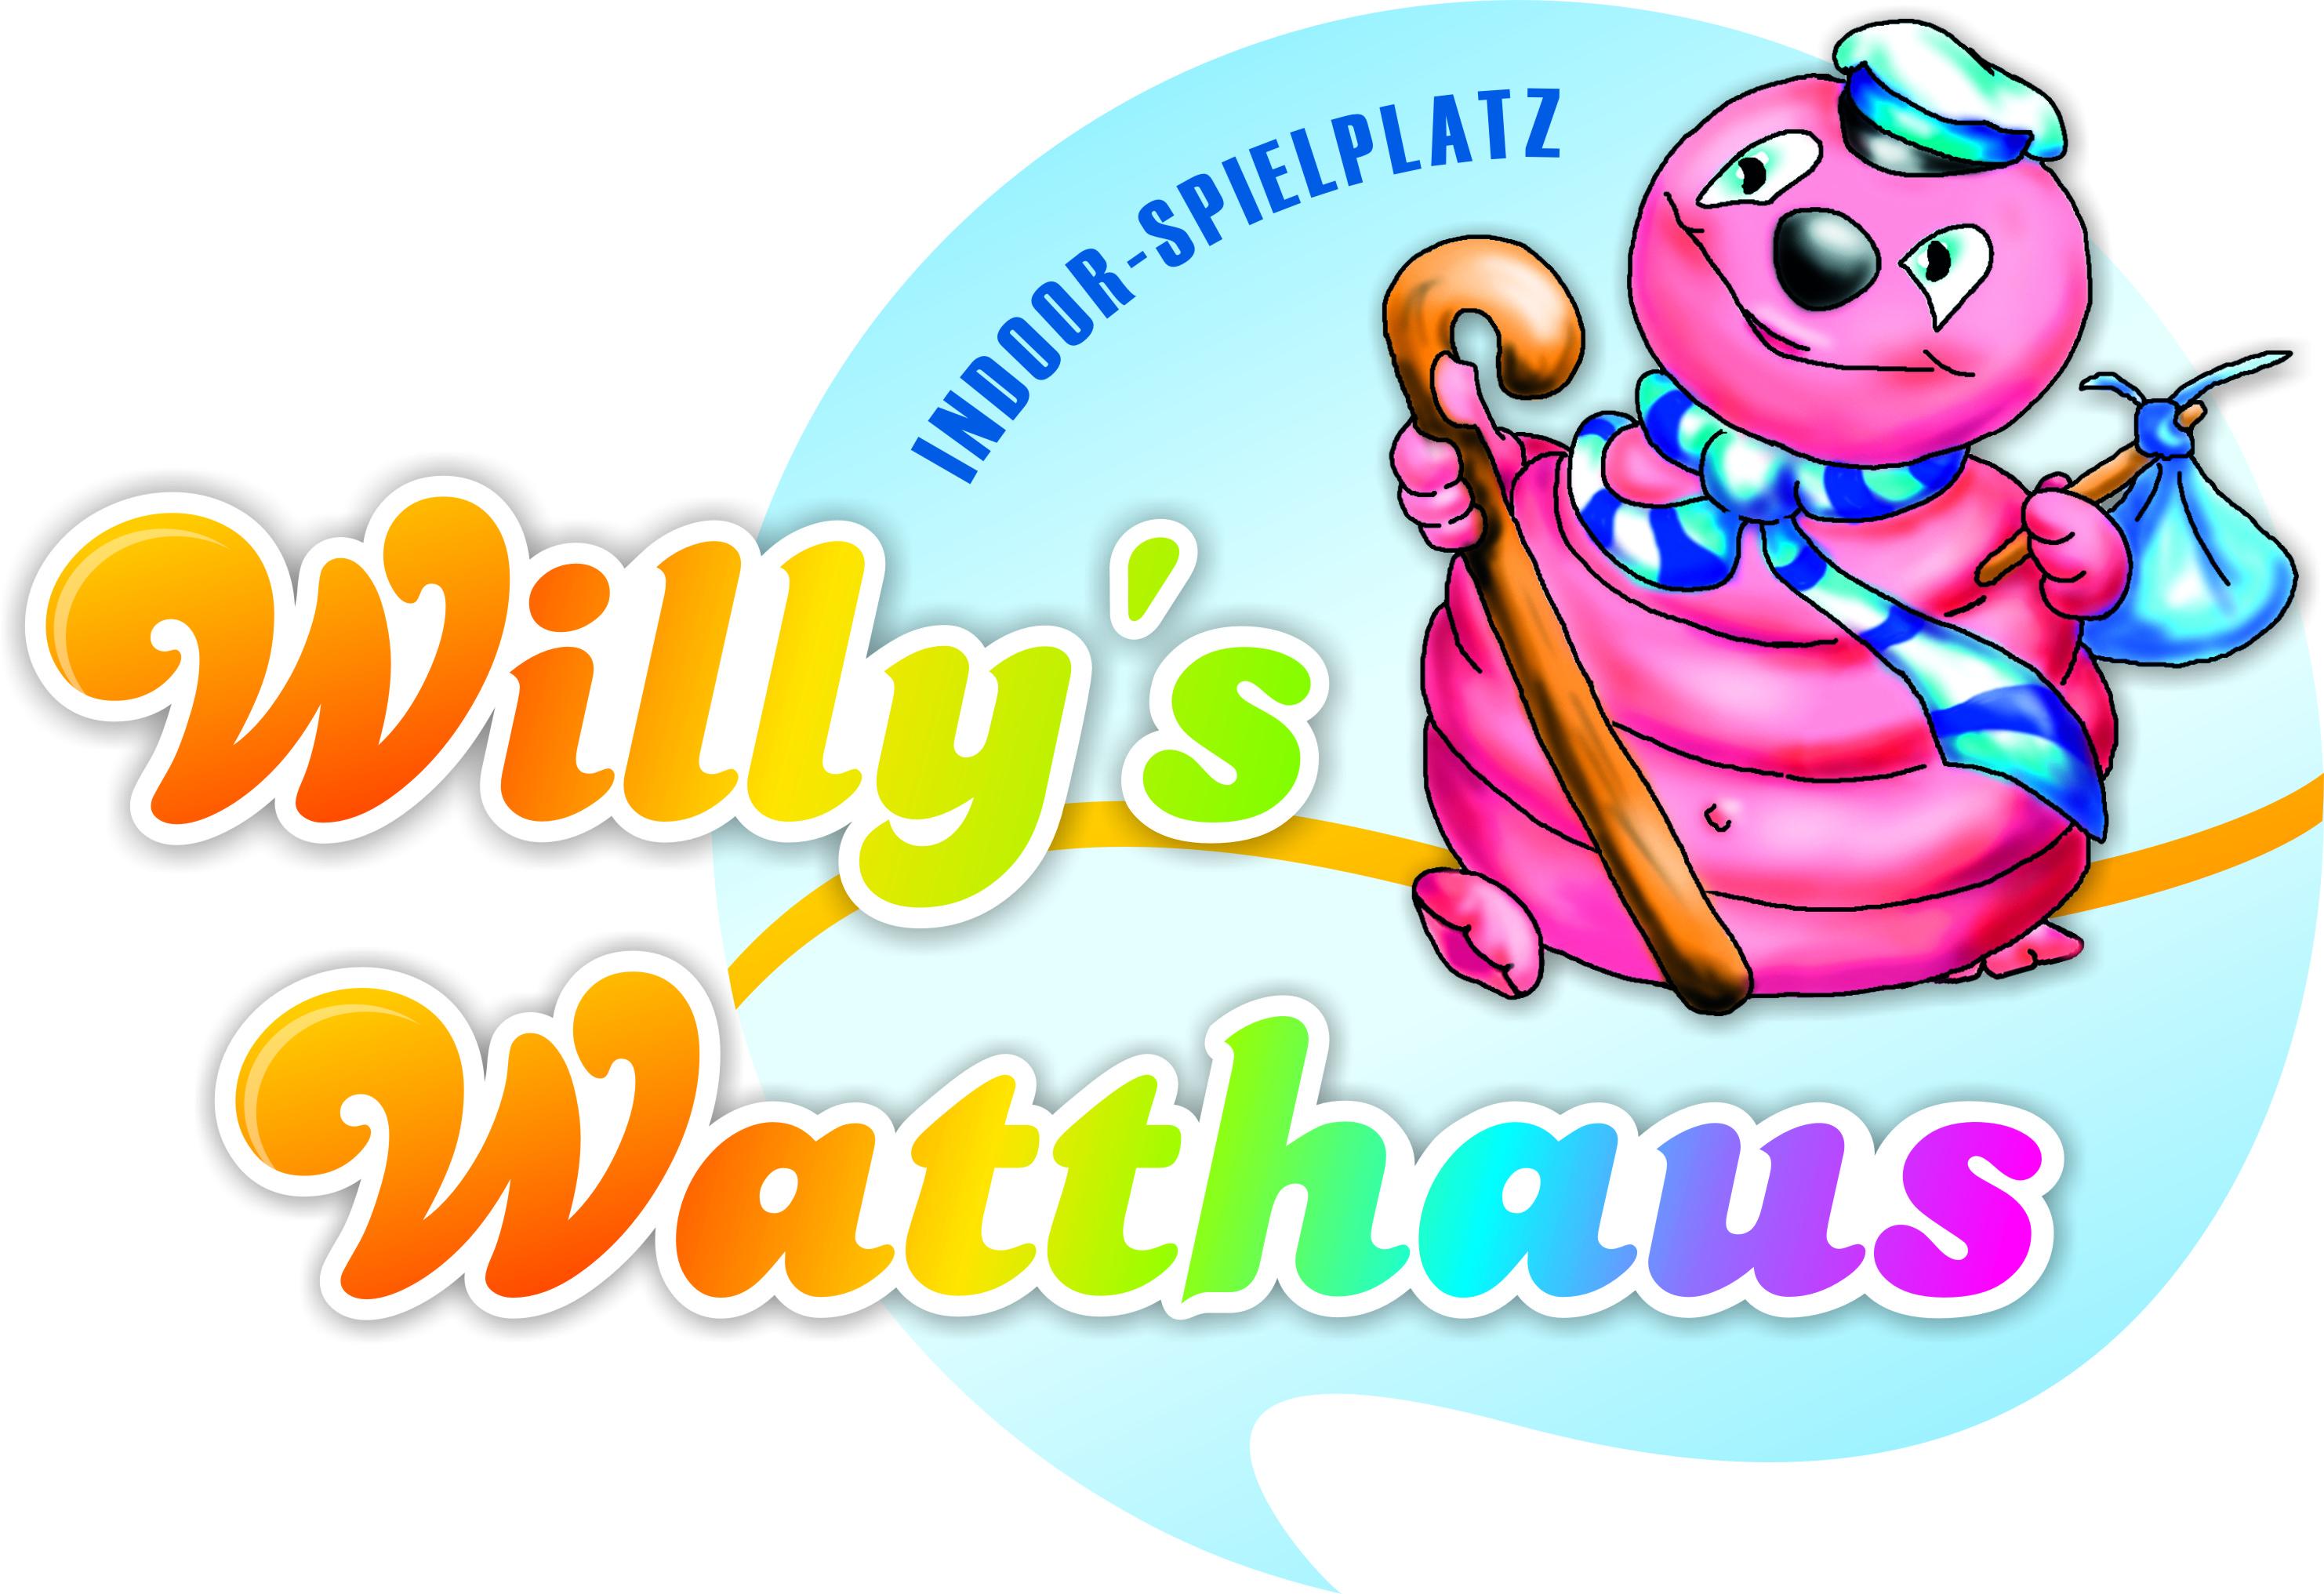 Willys Watthaus